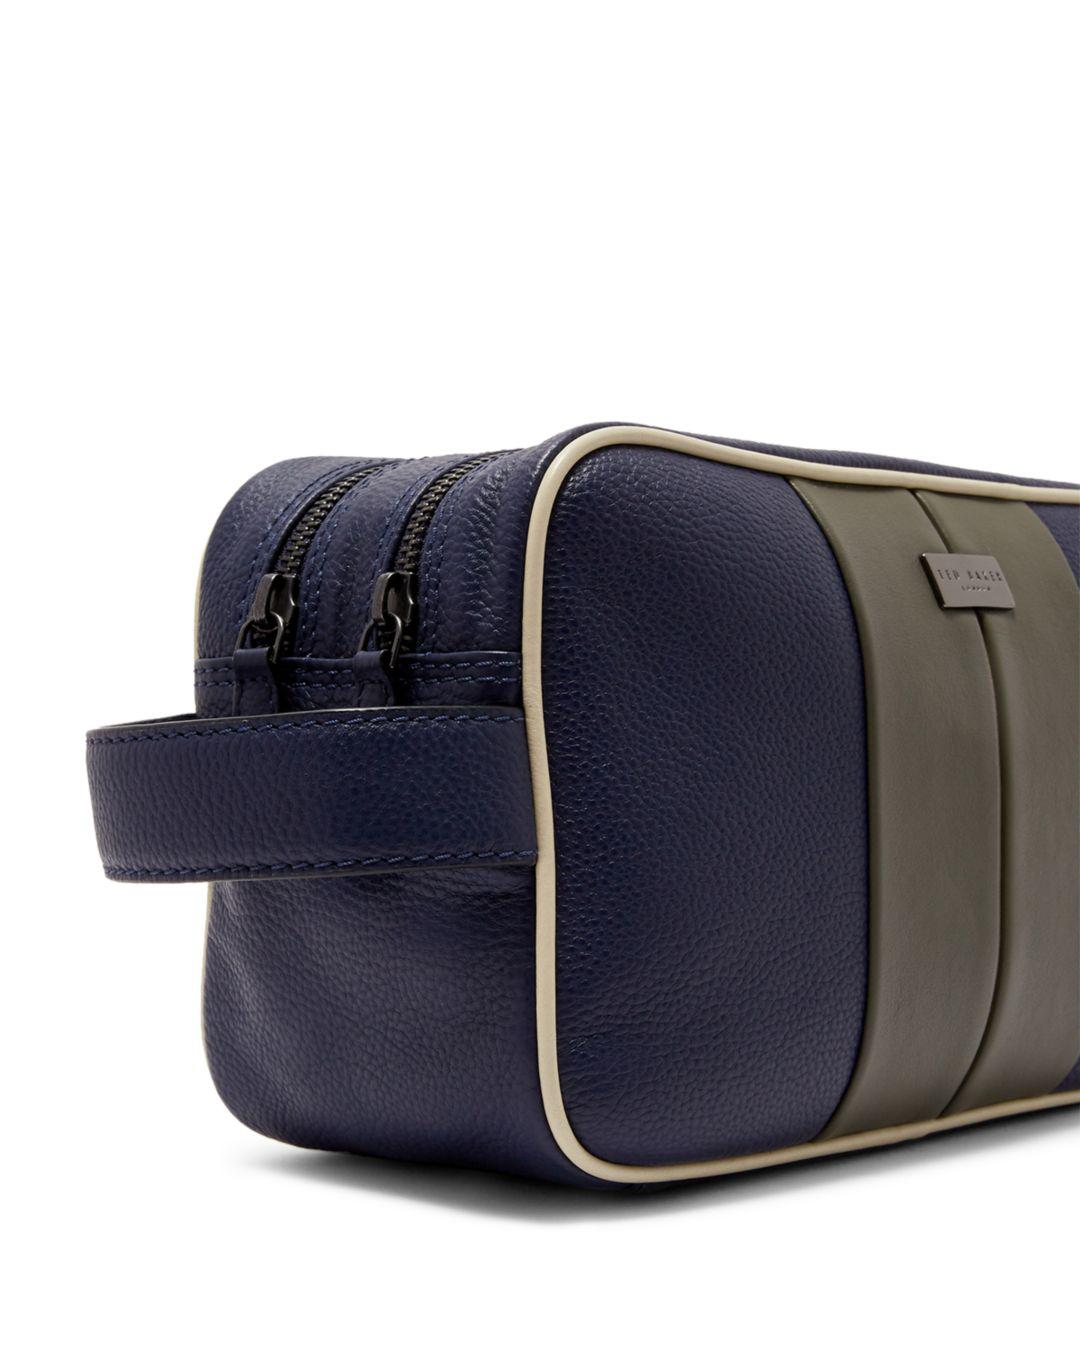 89f2fb388 Lyst - Ted Baker Marsha Striped Toiletry Bag in Blue for Men